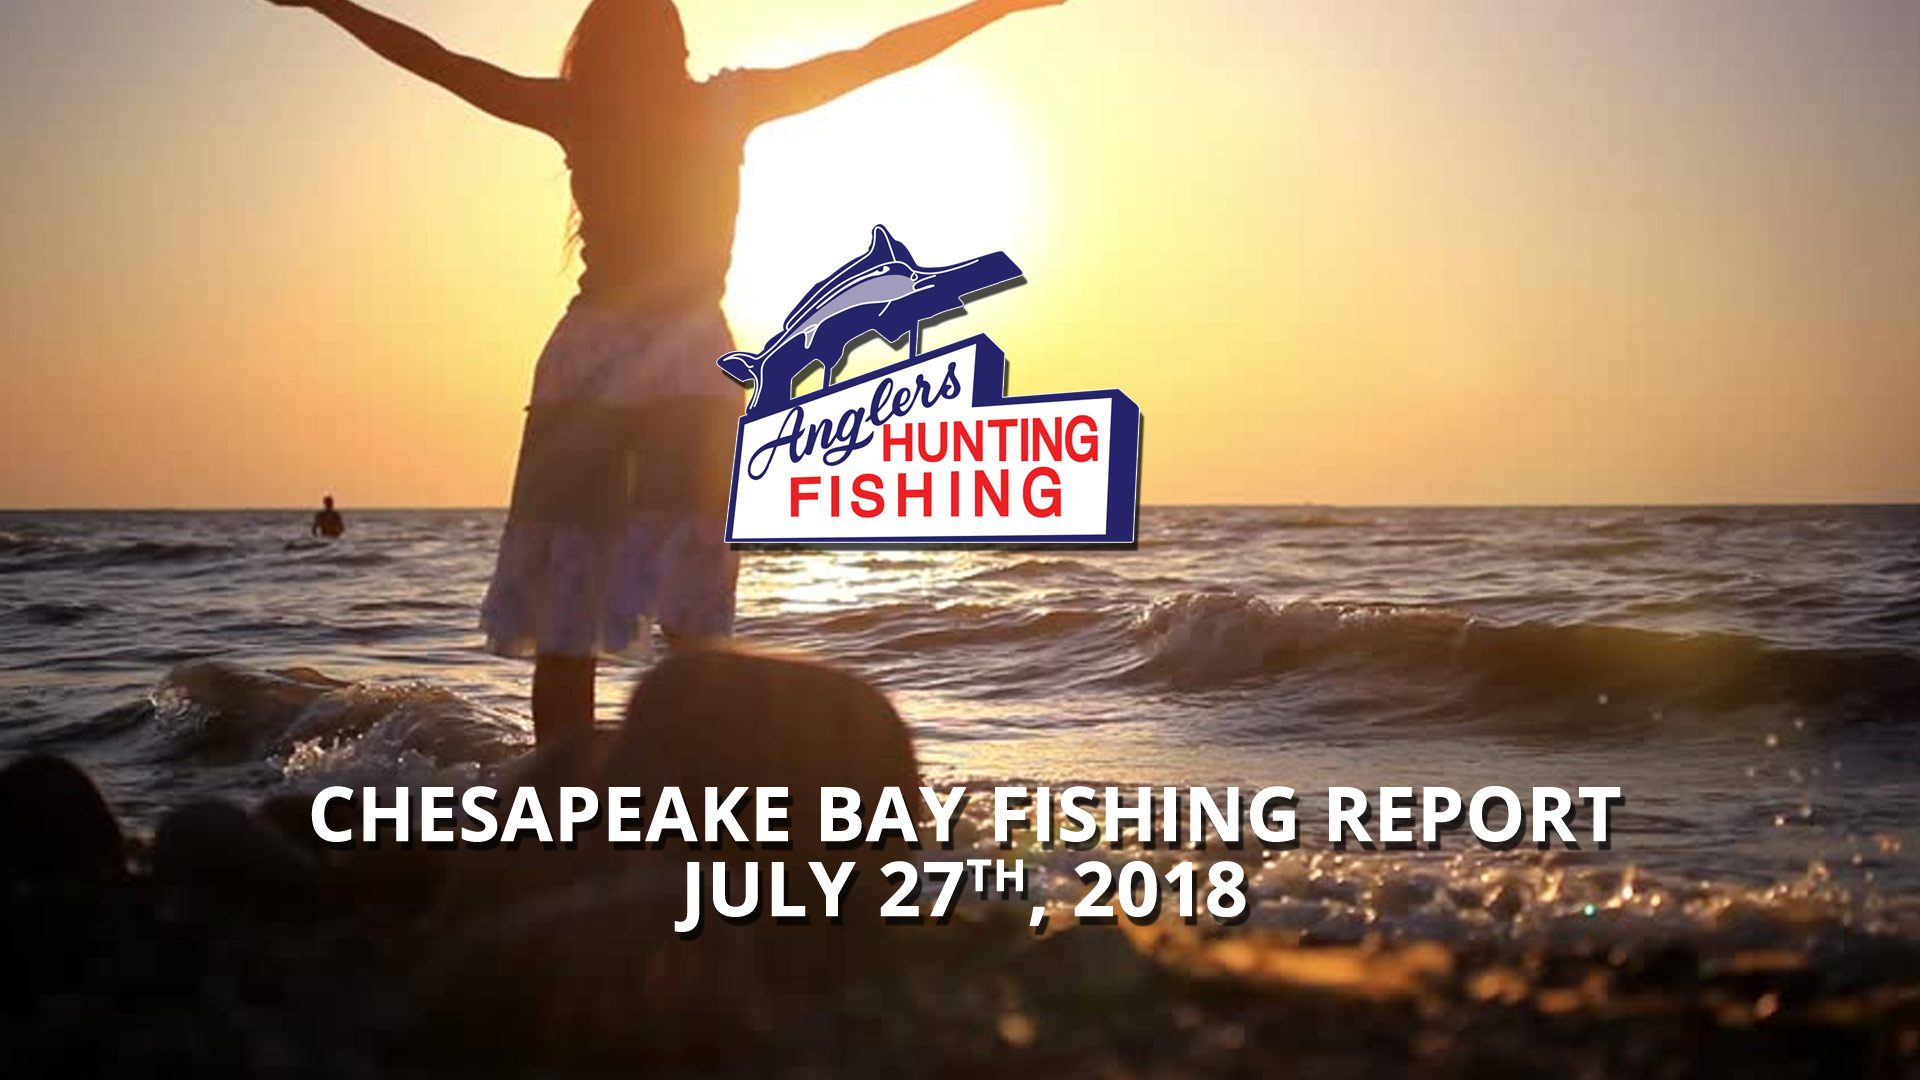 Chesapeake Bay Fishing Report - July 27th, 2018